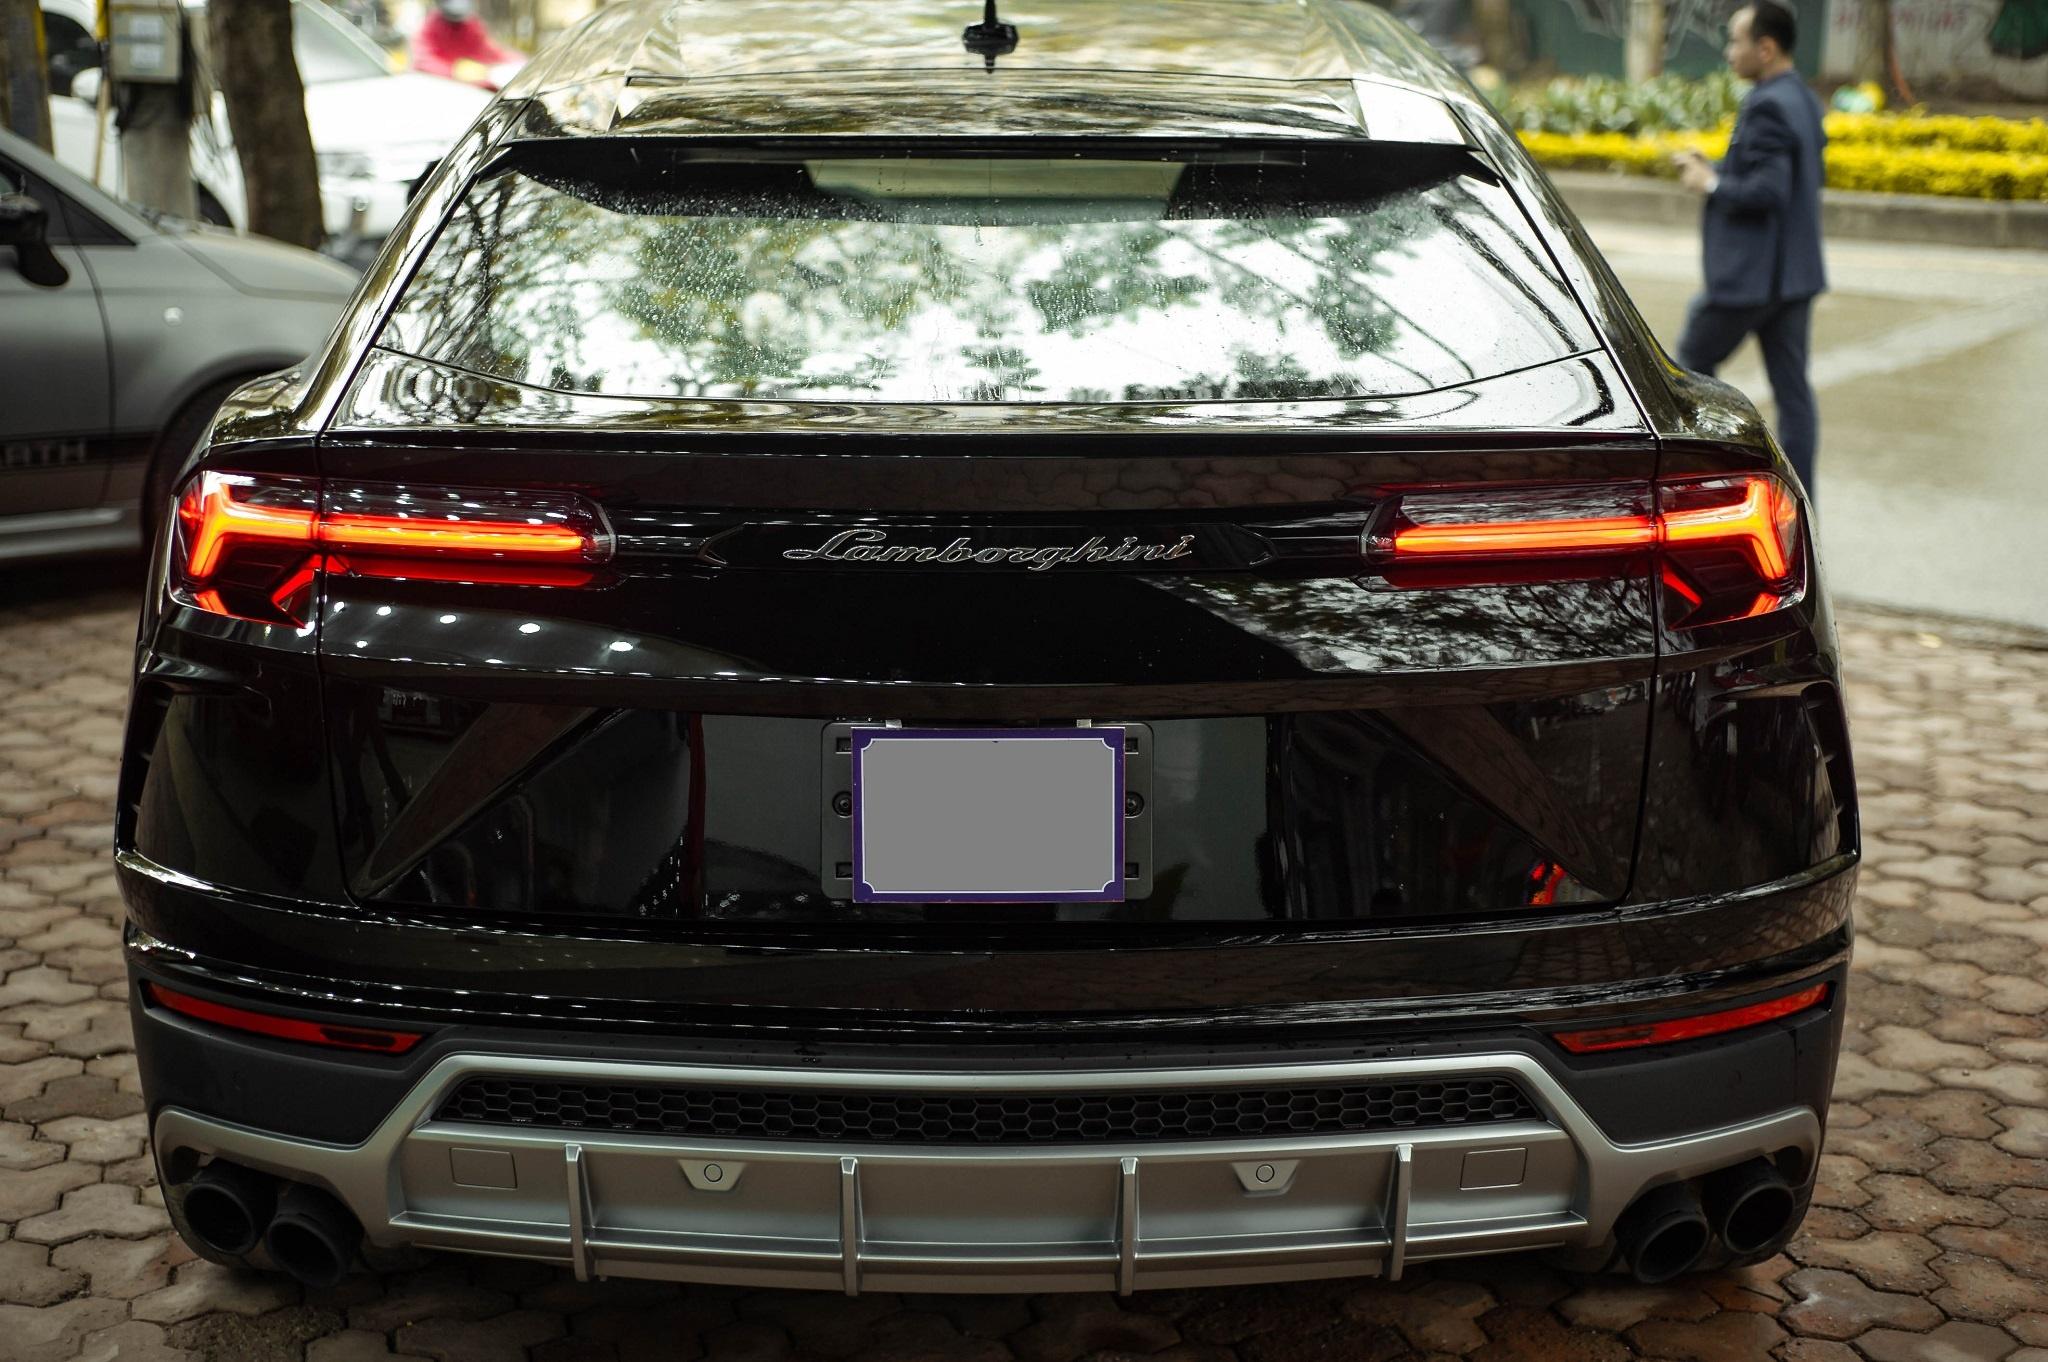 Ngam Lamborghini Urus mau den dau tien ve VN, gia khoang 1 trieu USD hinh anh 16 1_zing_21_.jpg